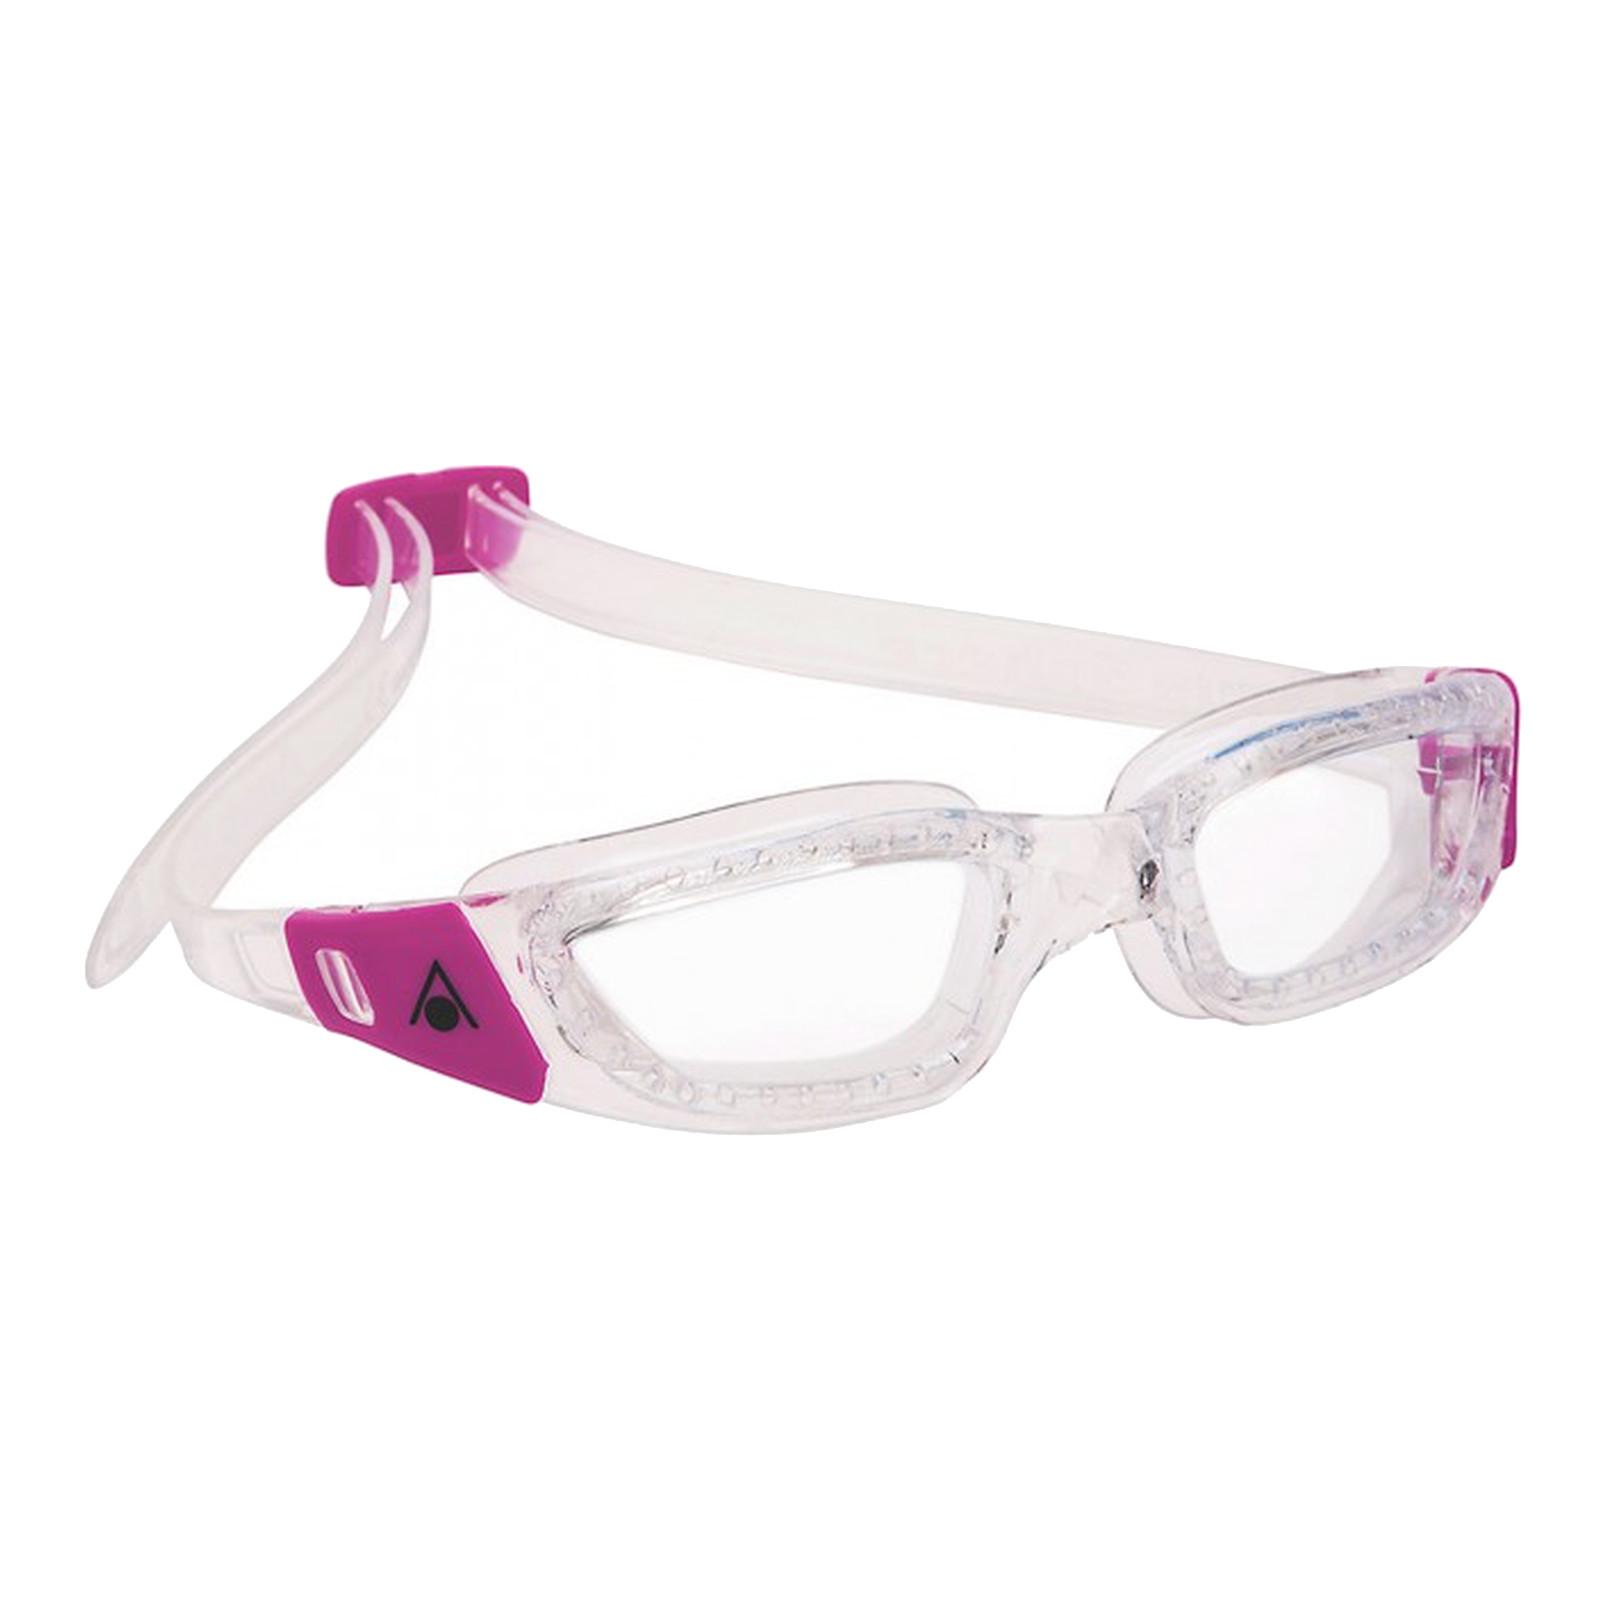 c8a9cc582 Aqua Sphere Kameleon Swimming Goggles Ep134111 Ladies Clear pink ...